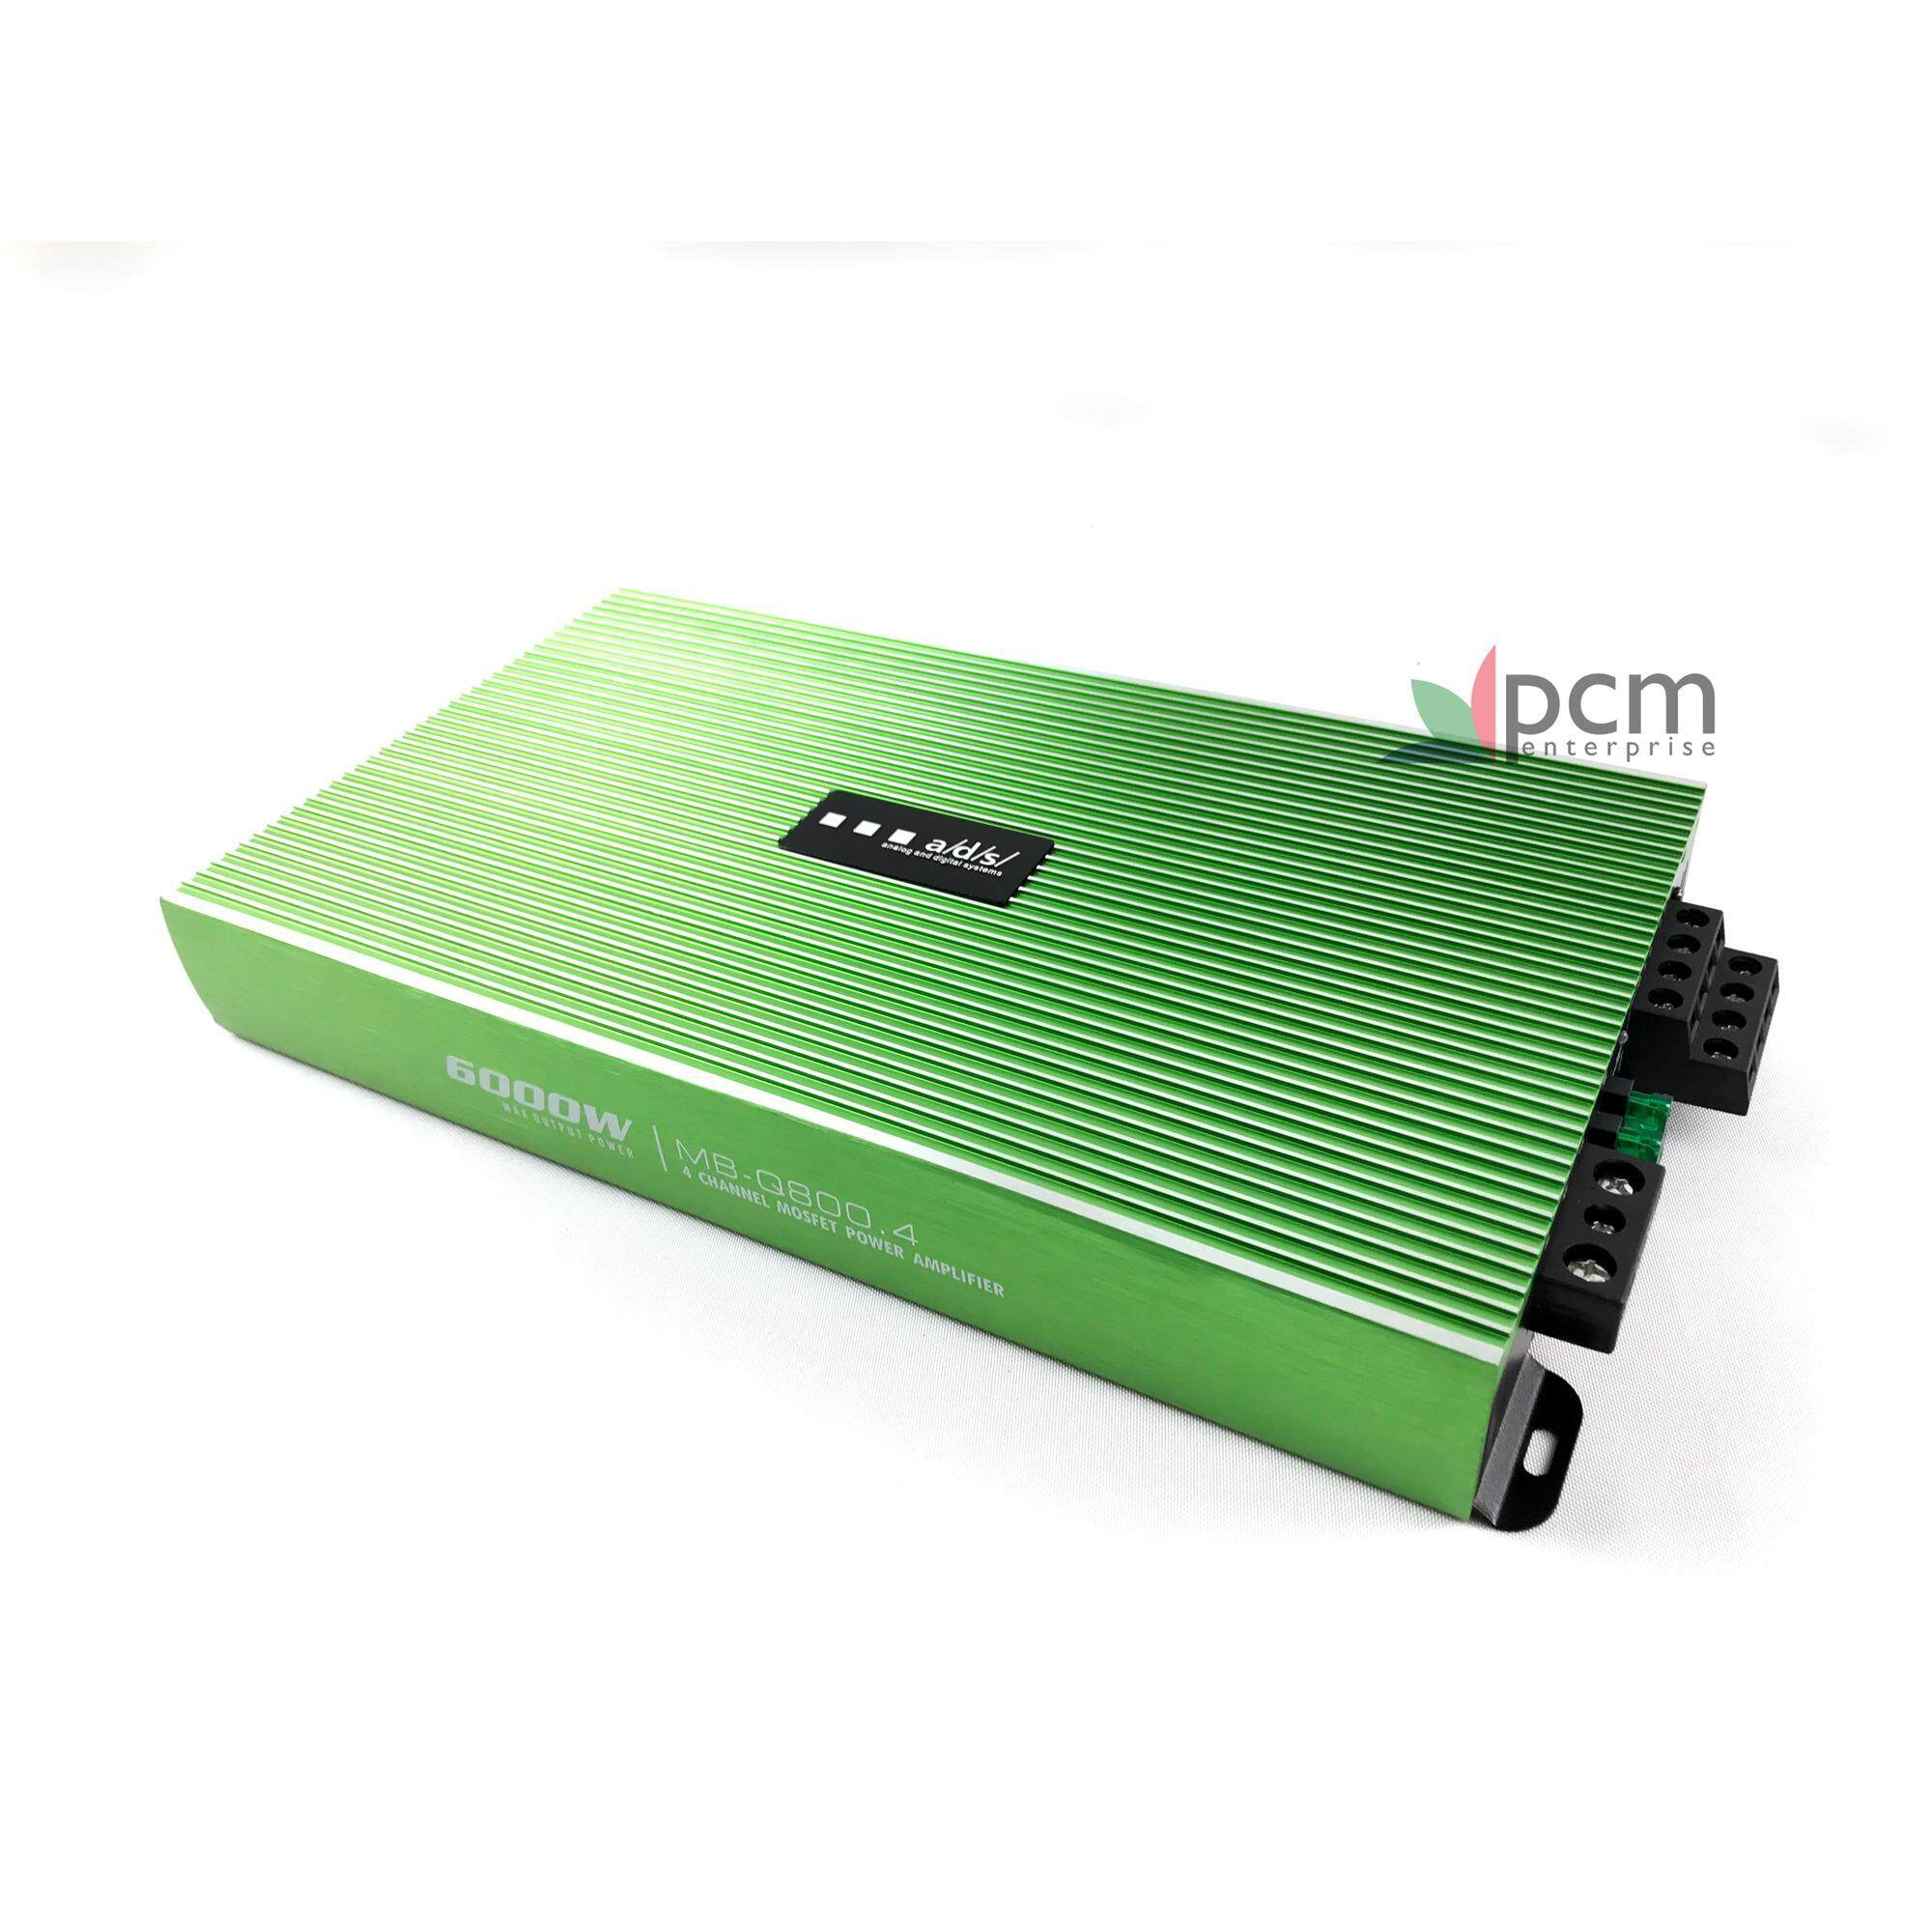 ADS [PCM] แอมป์ เครื่องขยายเสียง 4 ช่อง รถยนต์ รุ่น MB-Q800.4